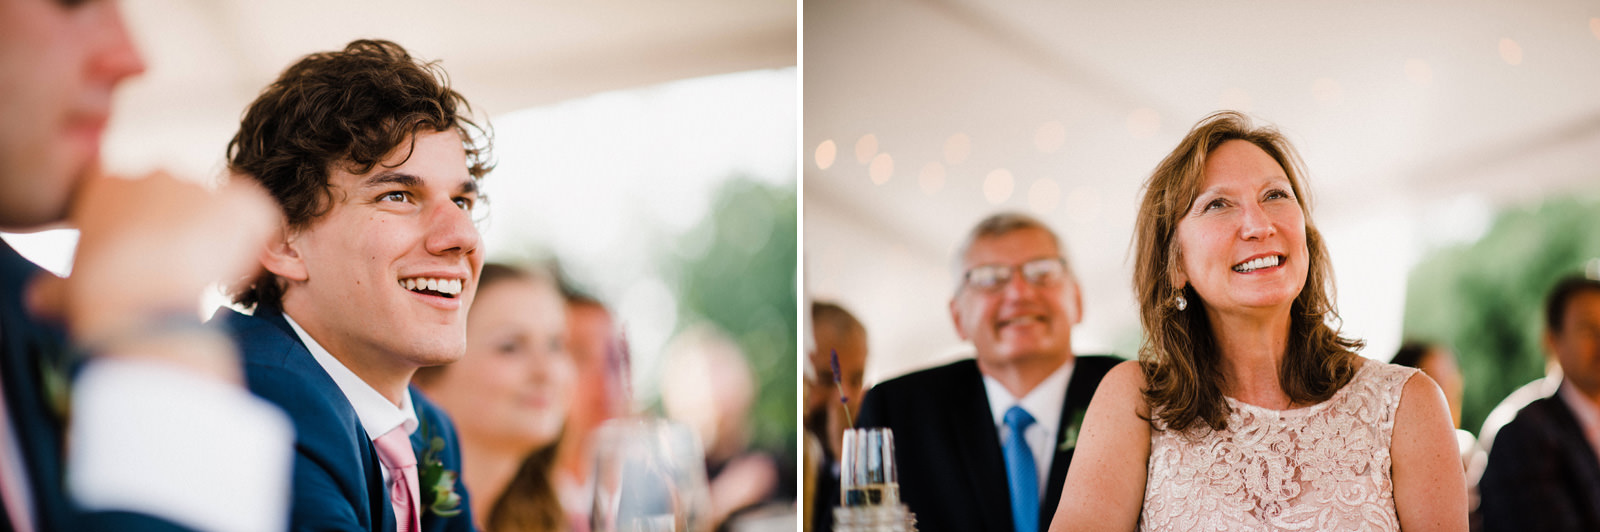 066-woodinville-lavendar-farm-wedding-with-golden-glowy-photos.jpg